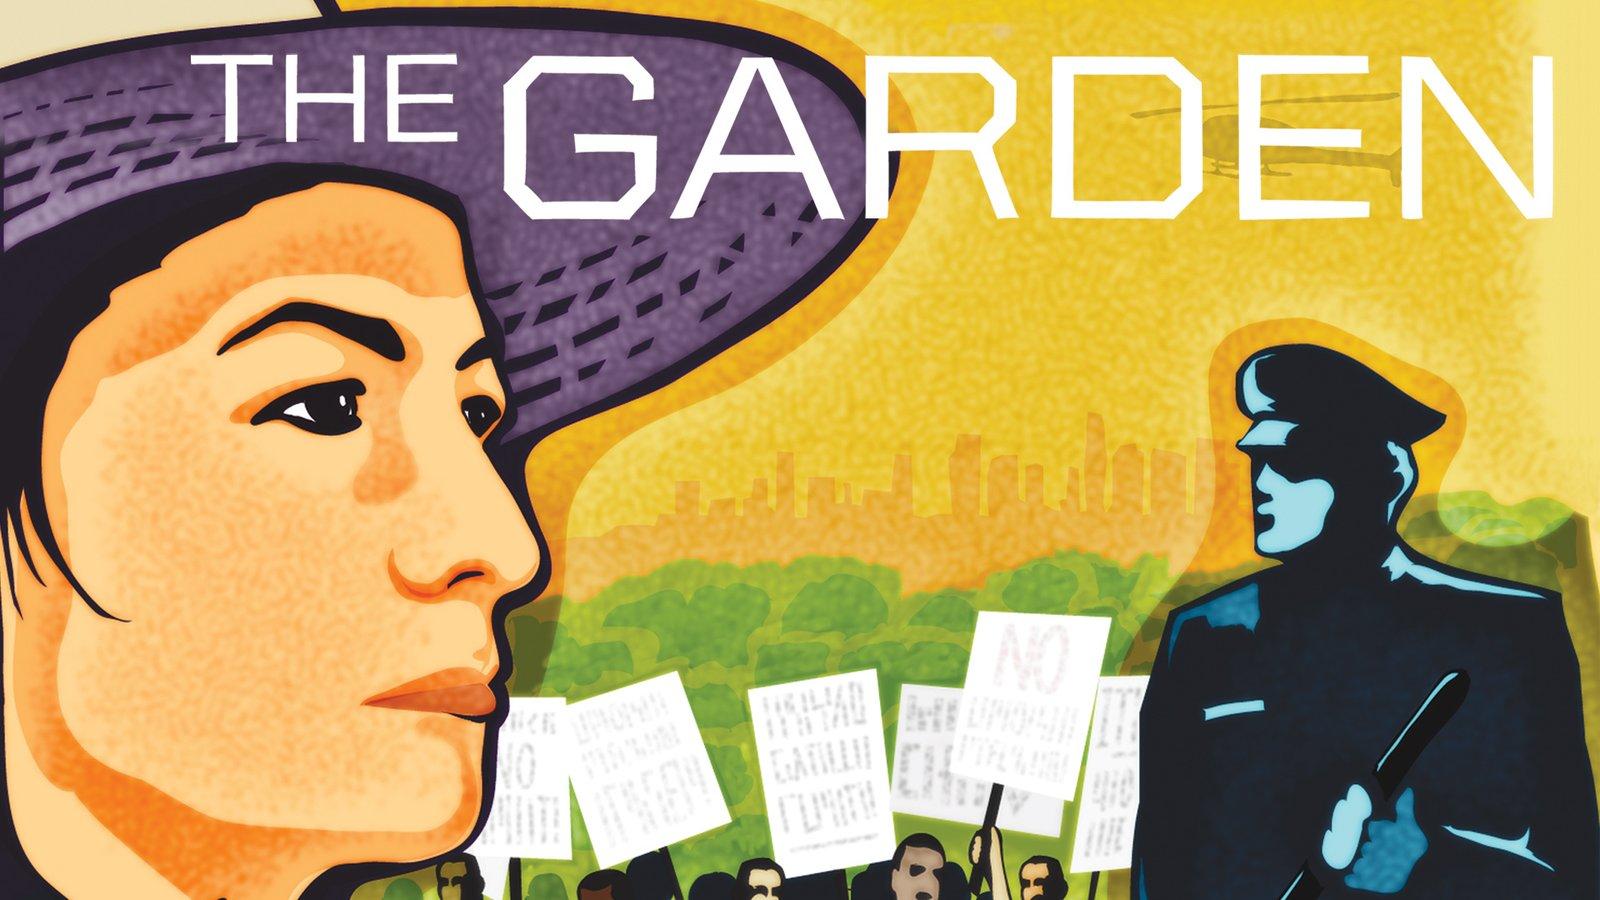 The Garden - Fighting for an LA Urban Garden